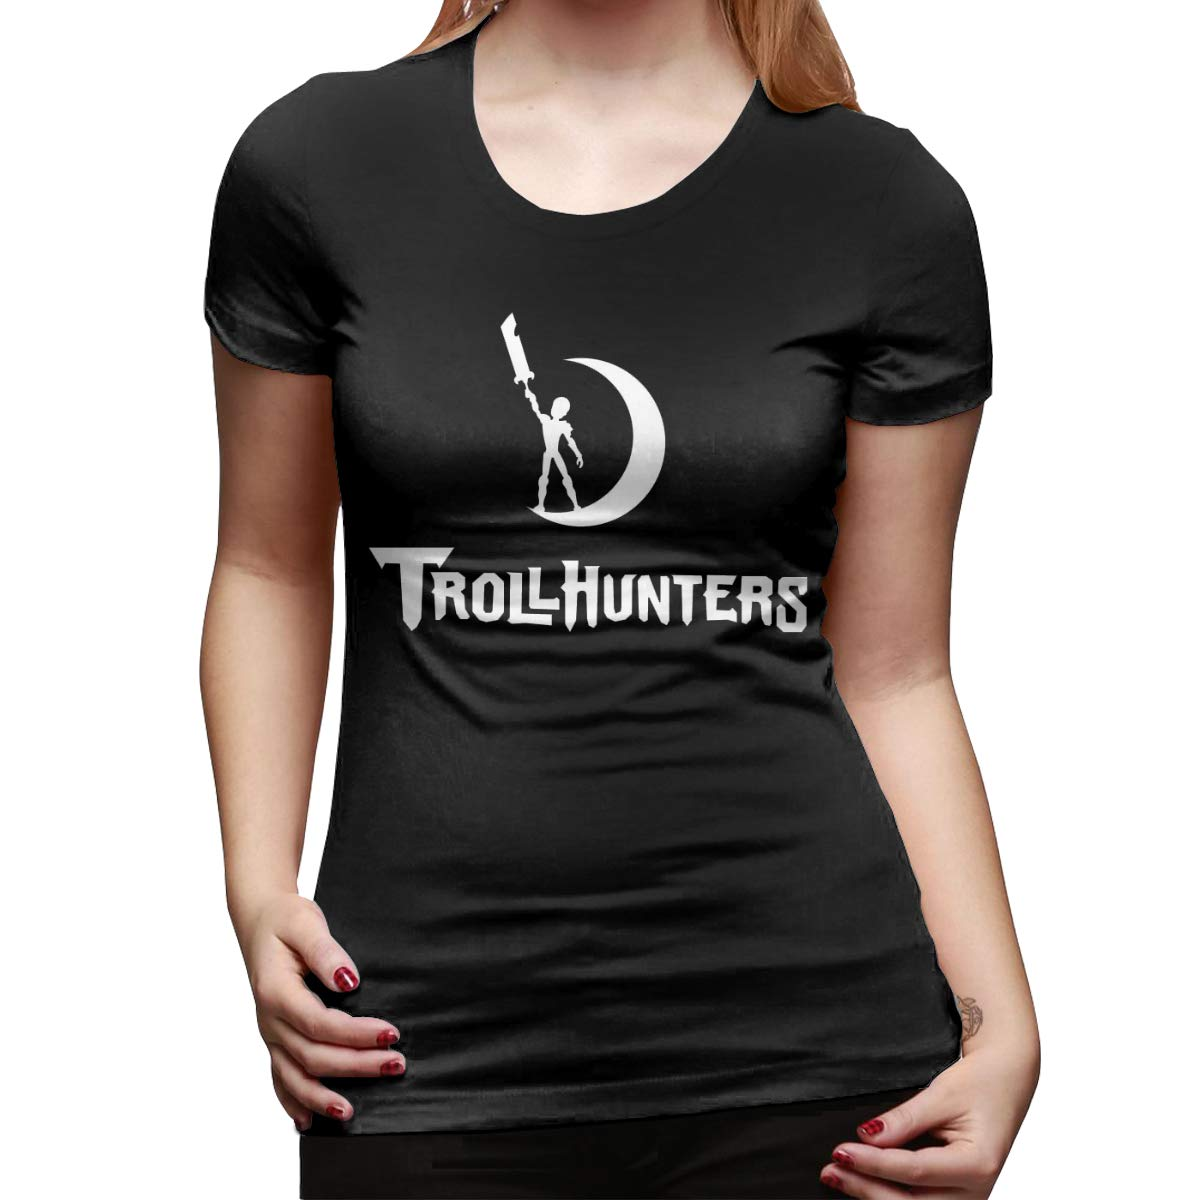 Longzhizi8 Womens T-Shirts Trollhunters Slim Fit Graphic Tees Tops Blouse Short Sleeve T-Shirt